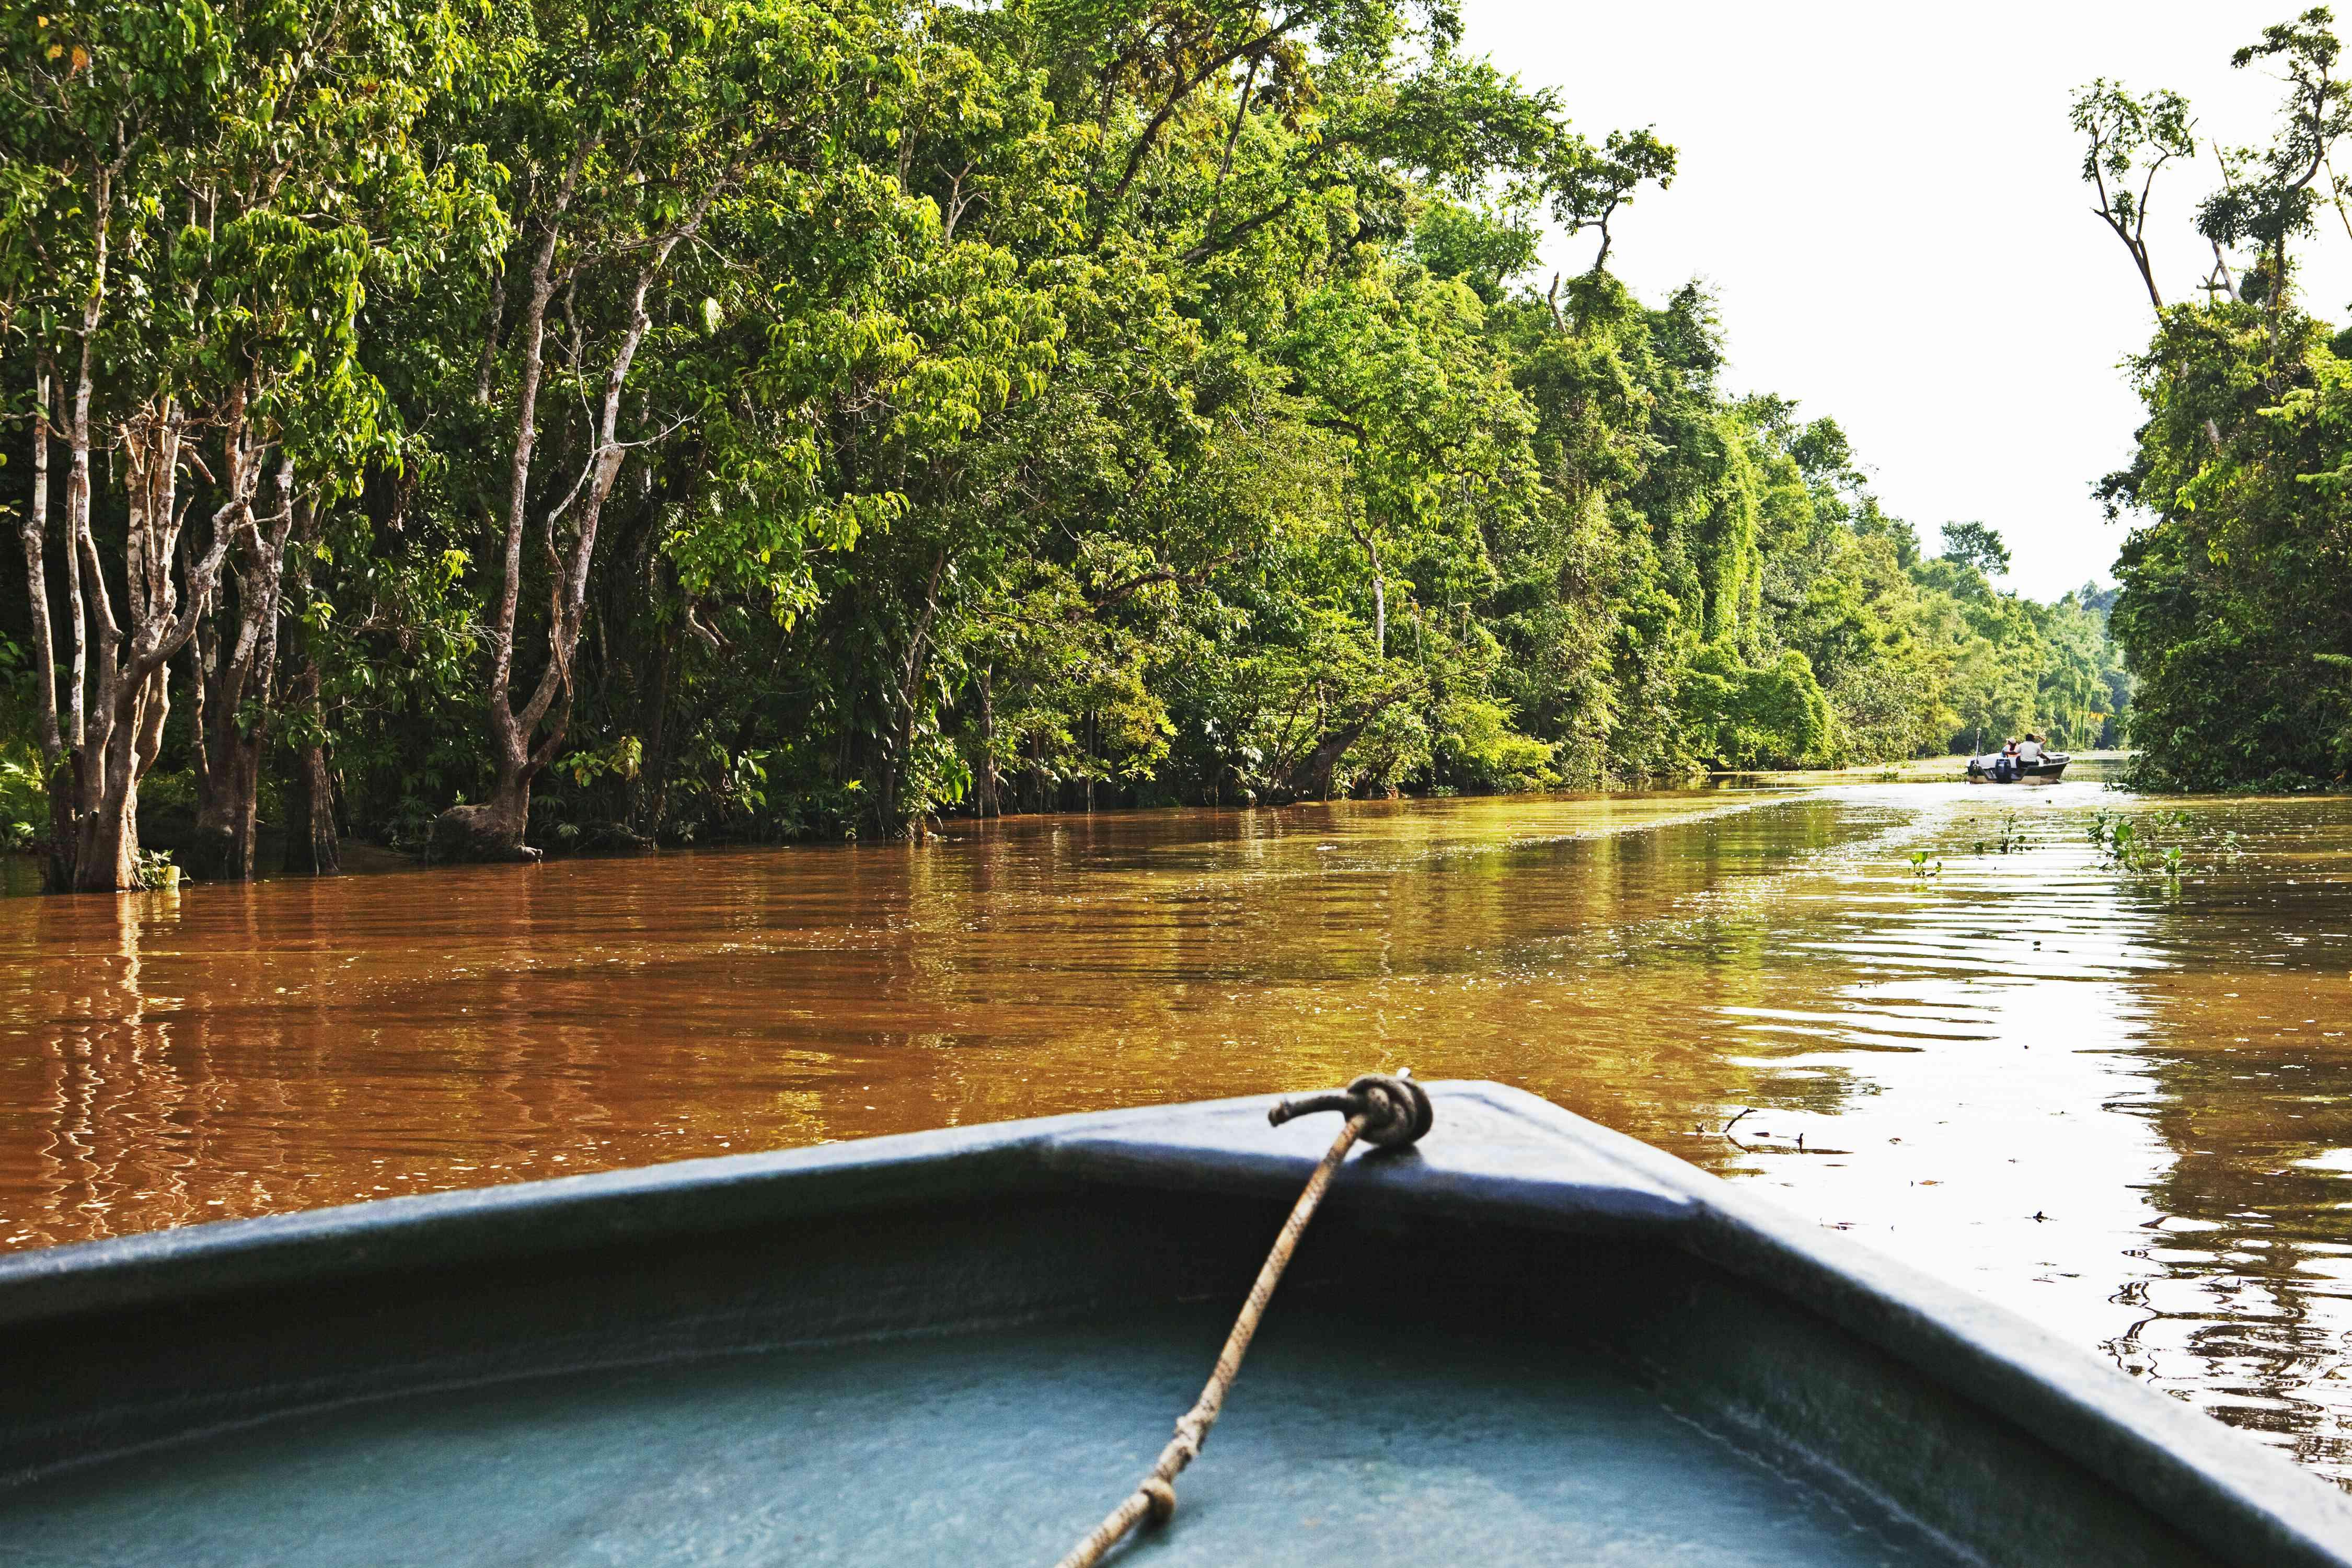 A boat on the muddy Kinabatangan River in Sabah, Borneo